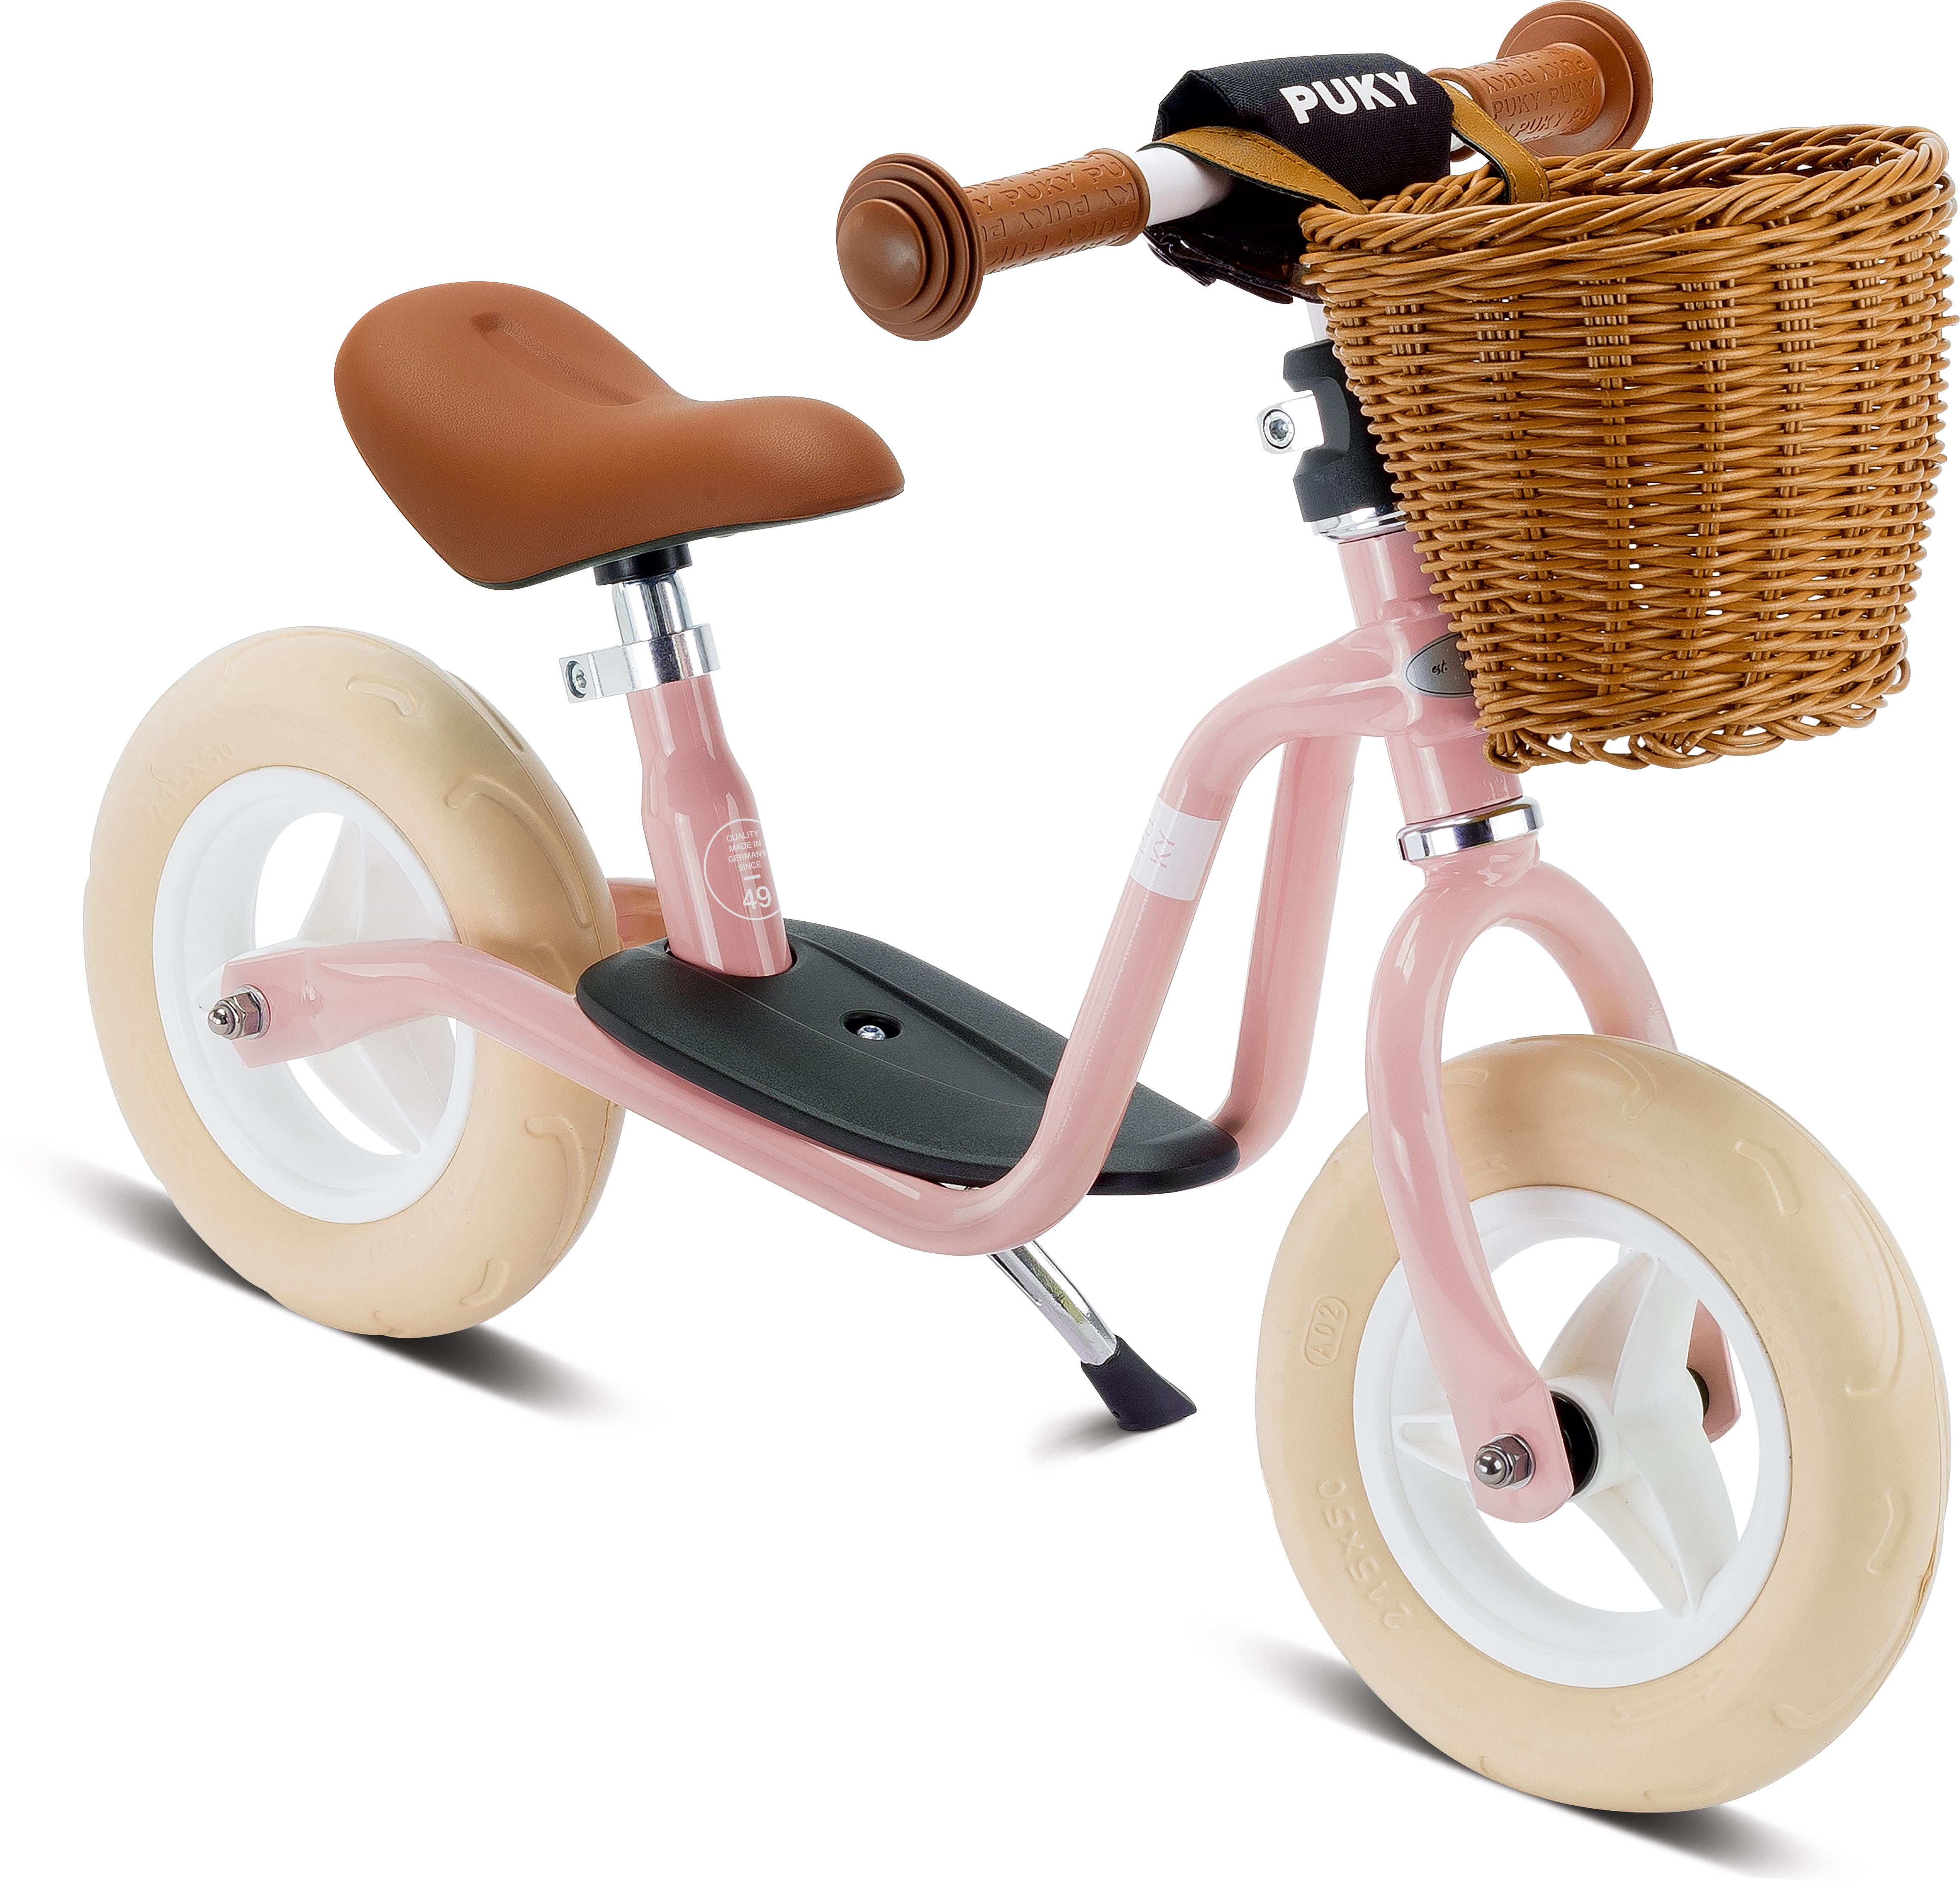 PUKY - LR M Classic Balance Bike - Retro Rose (4094)